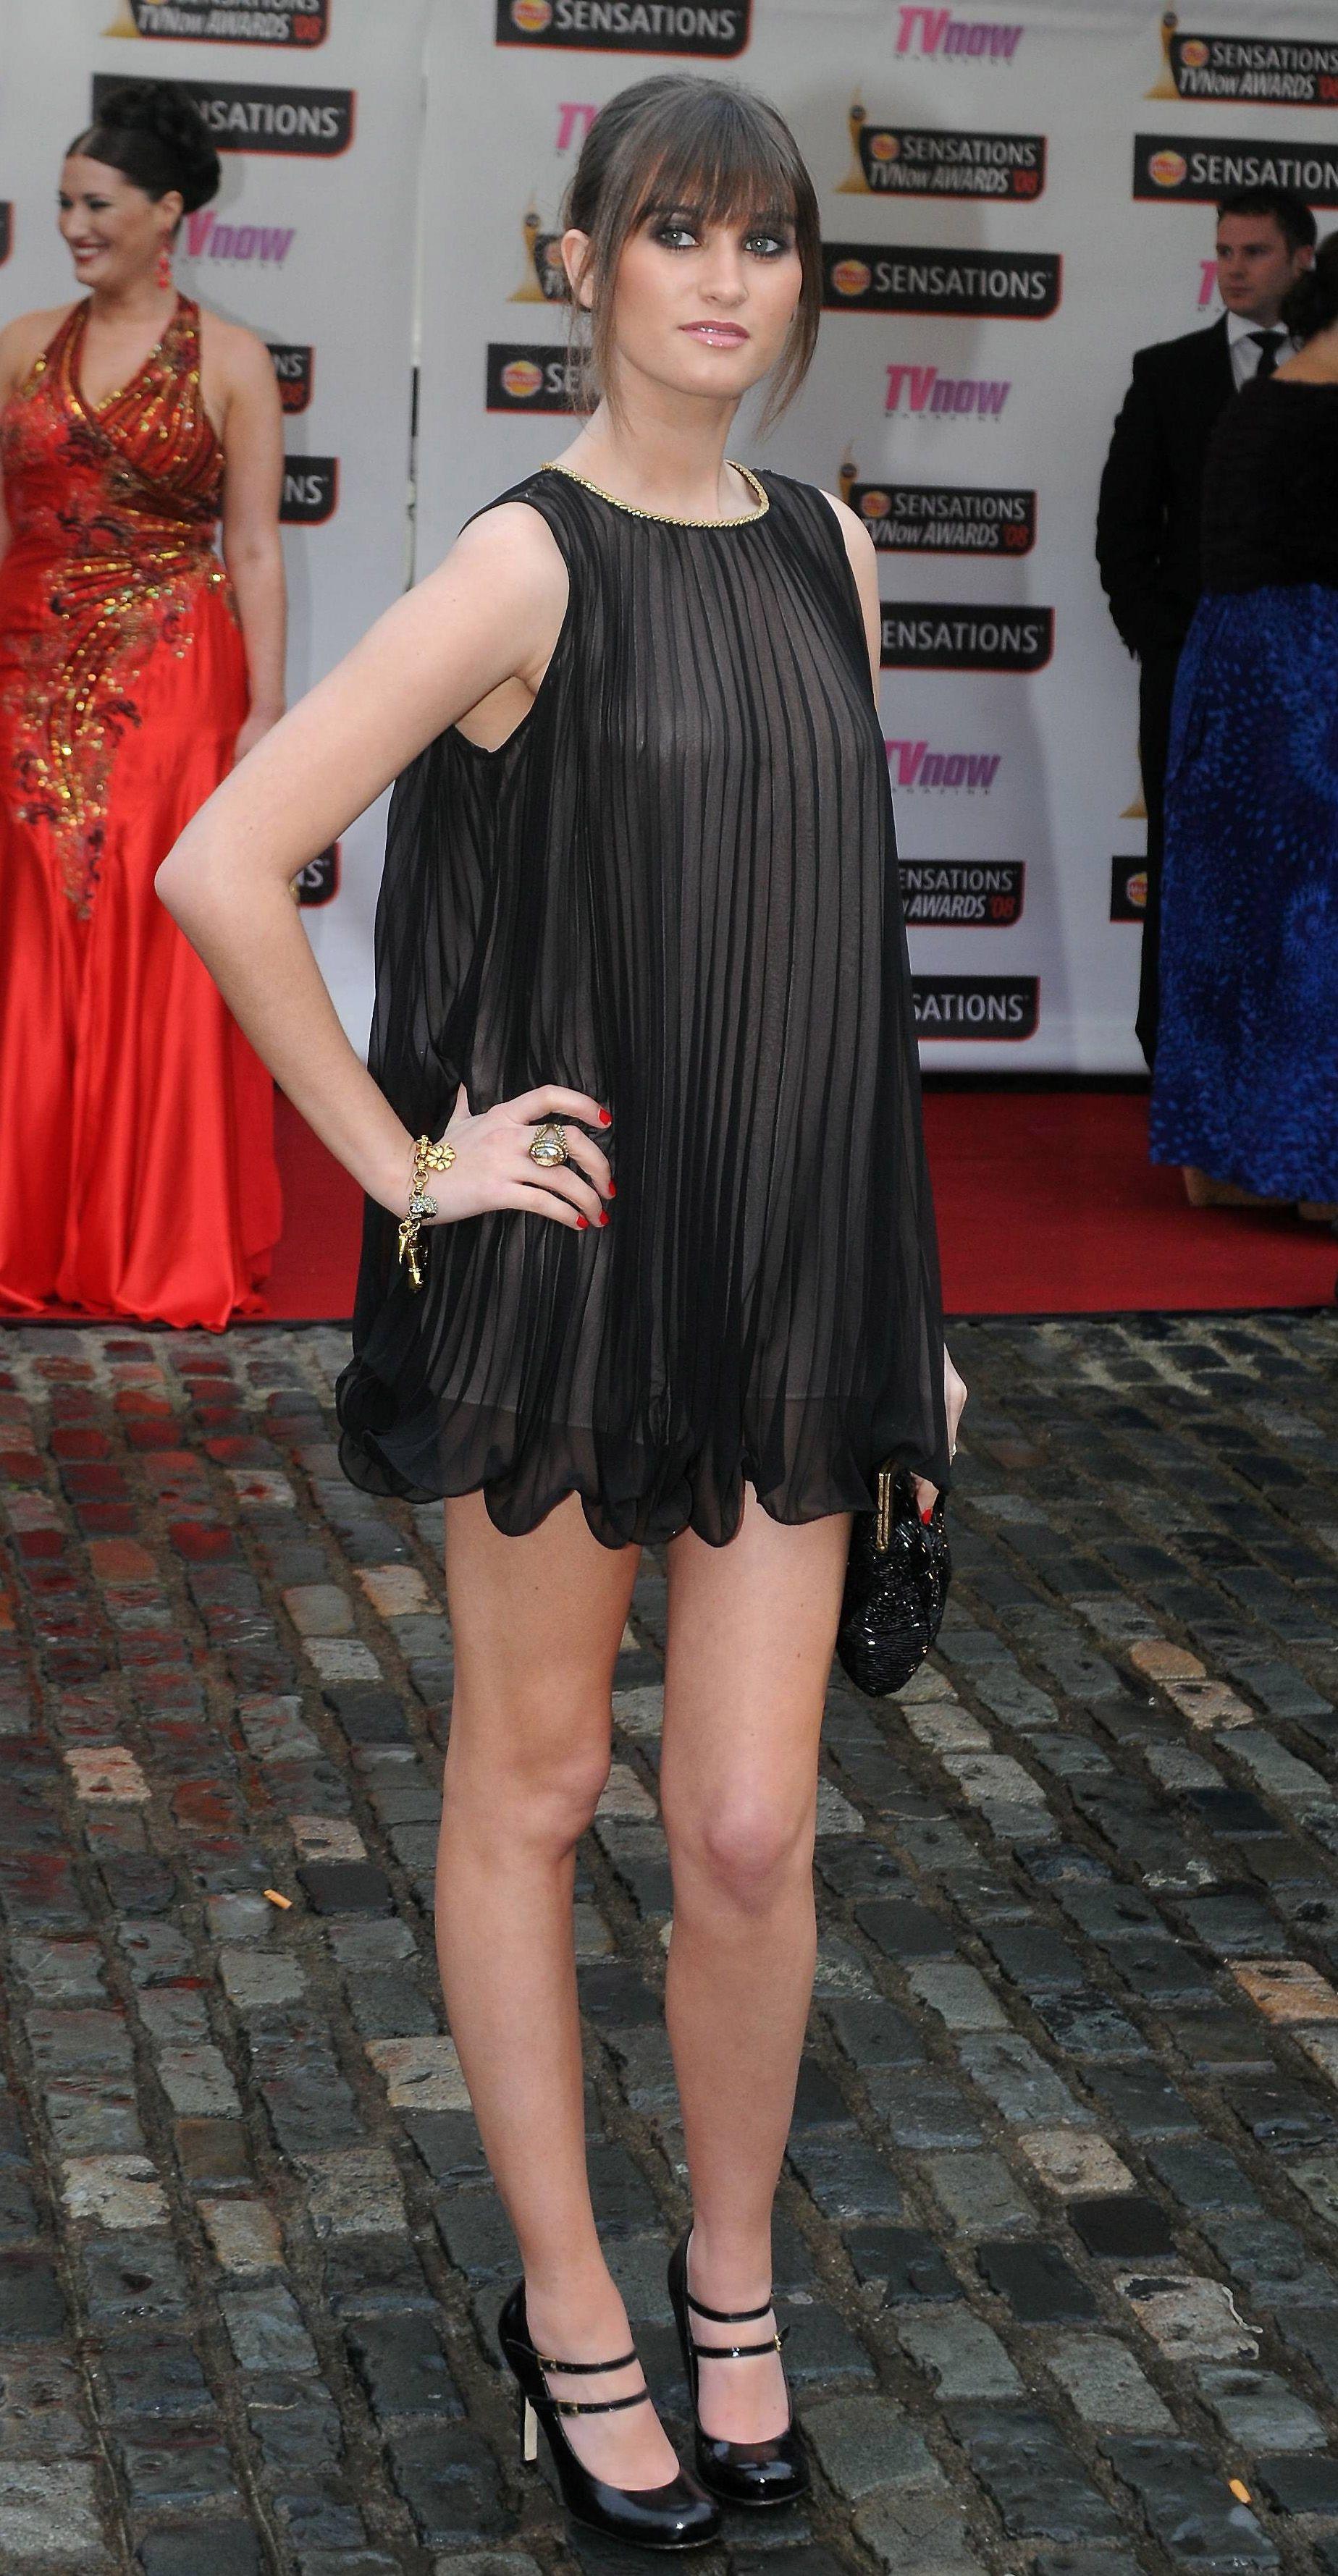 Freya Mavor (born 1993) Sex videos Geetu Mohandas,Natalie West